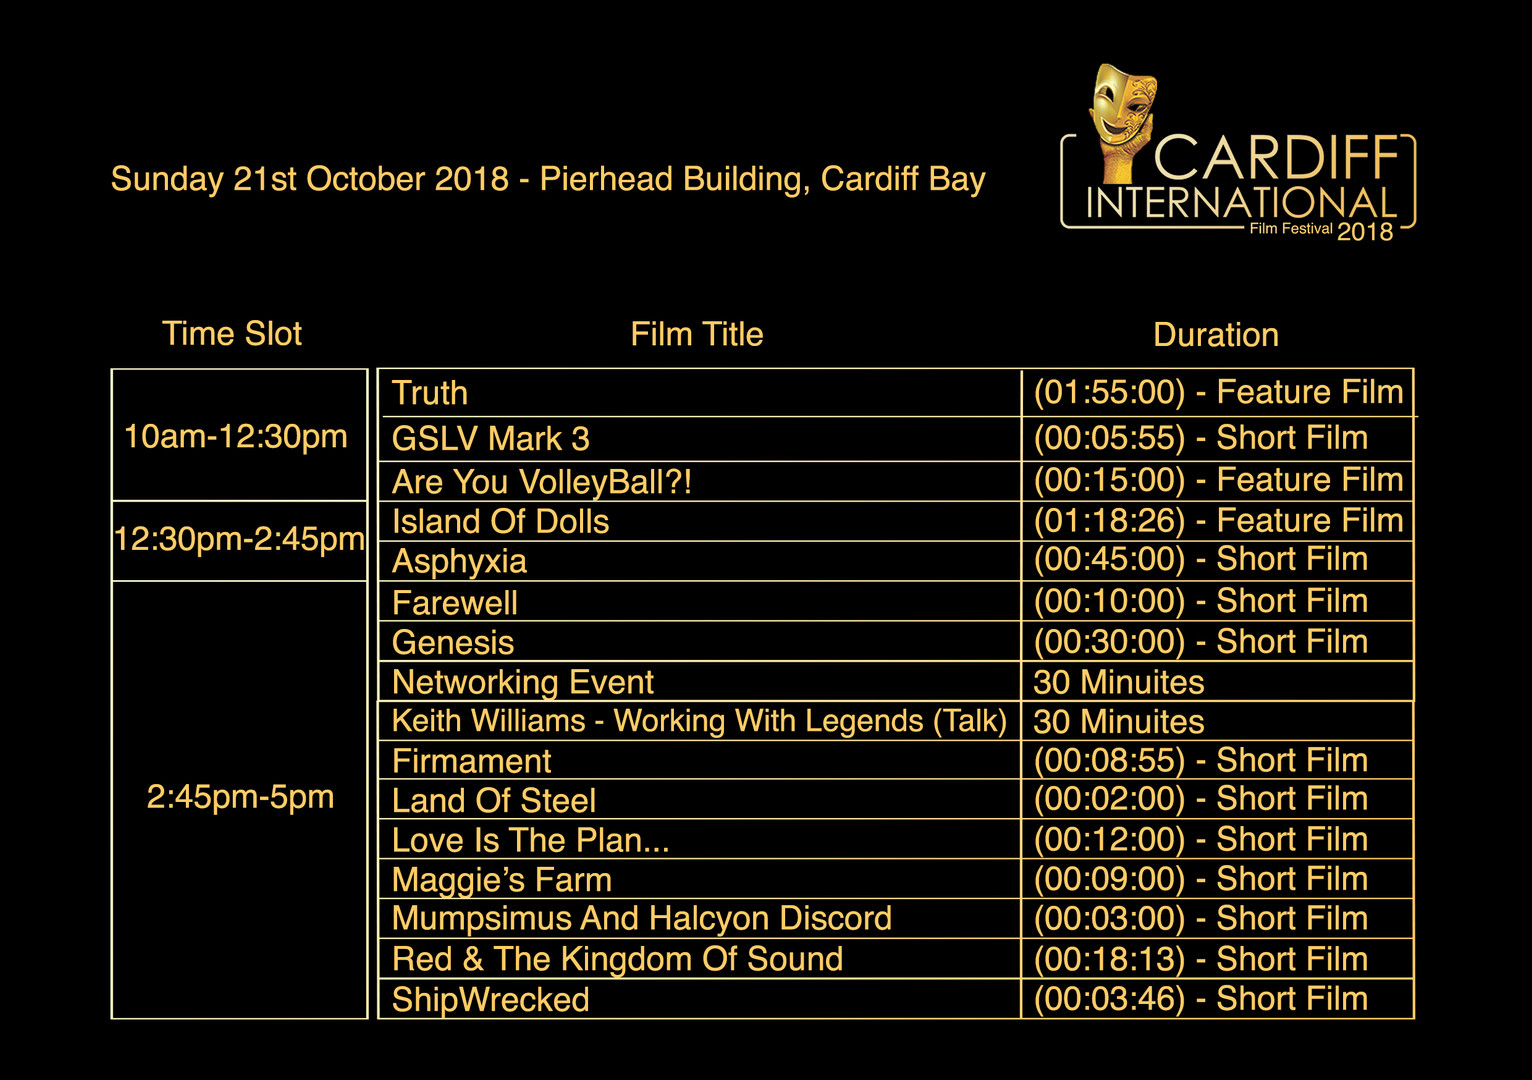 Sunday October 21st - Pierhead Building